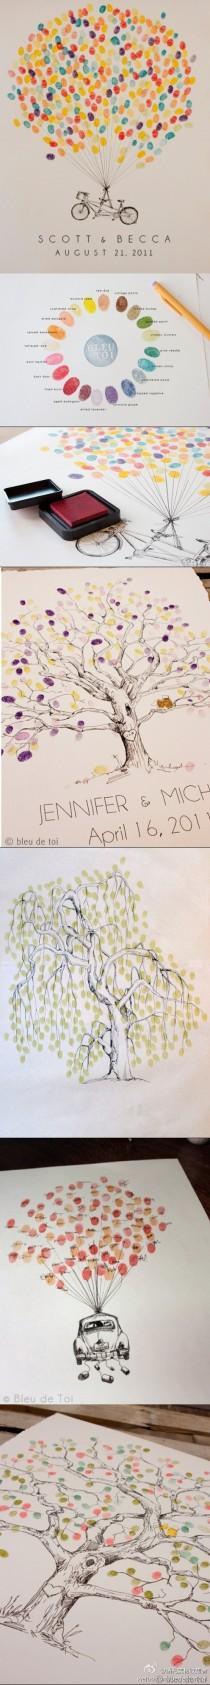 wedding photo - Creative Wedding Fingerprint Tree Alternative Wedding Guestbook Ideas